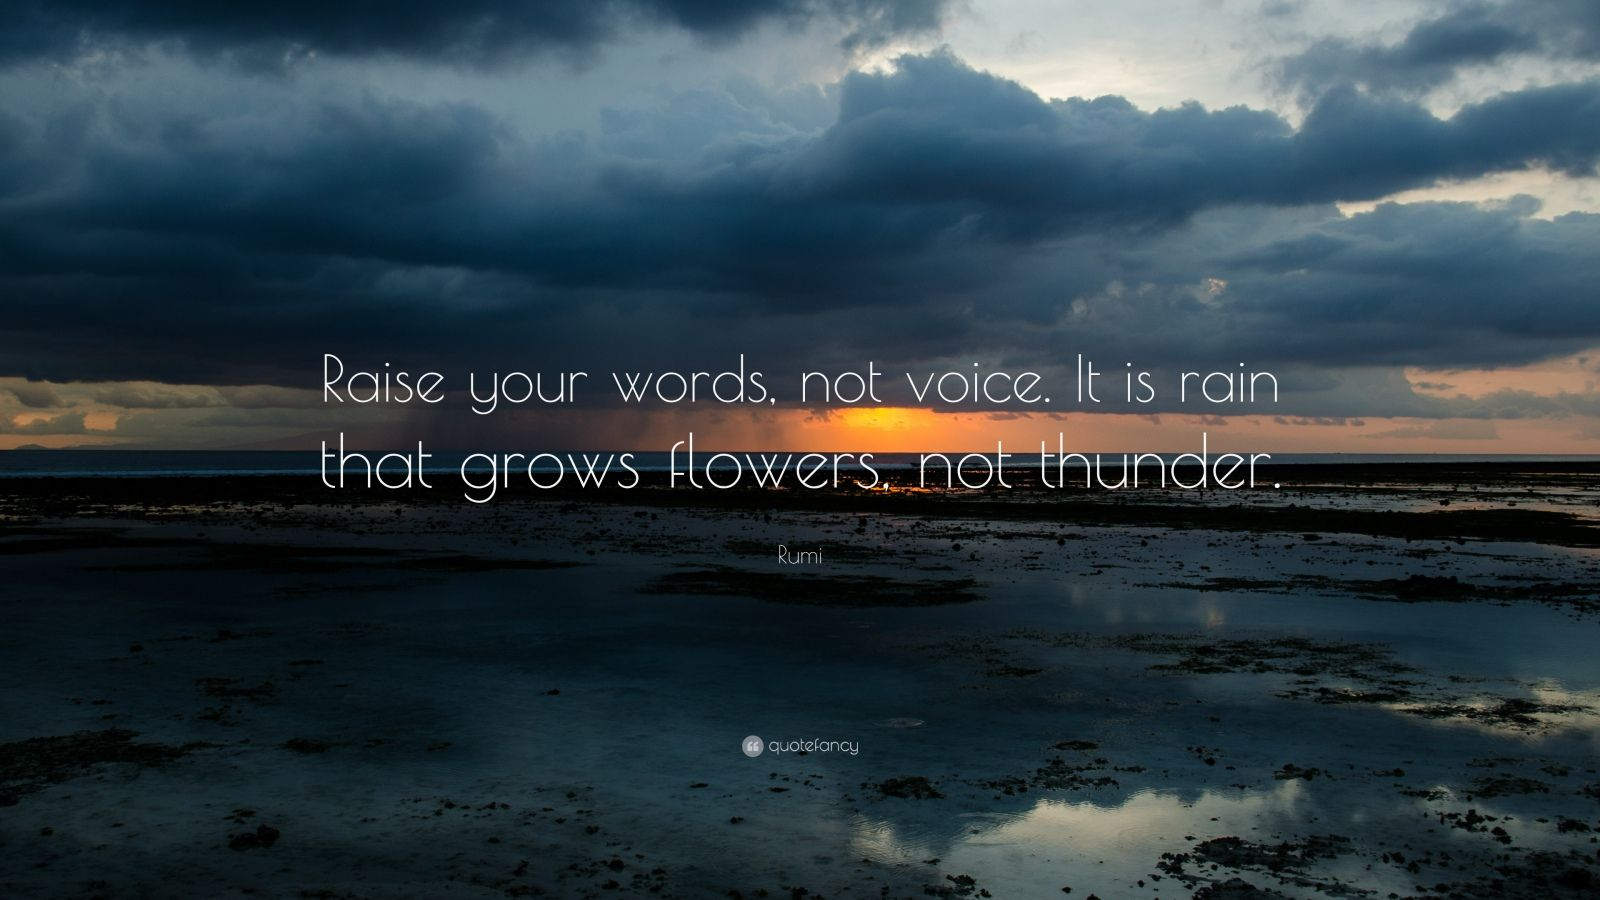 Rumi Quotes About Friendship Friendship Quotesrumi  Bitami